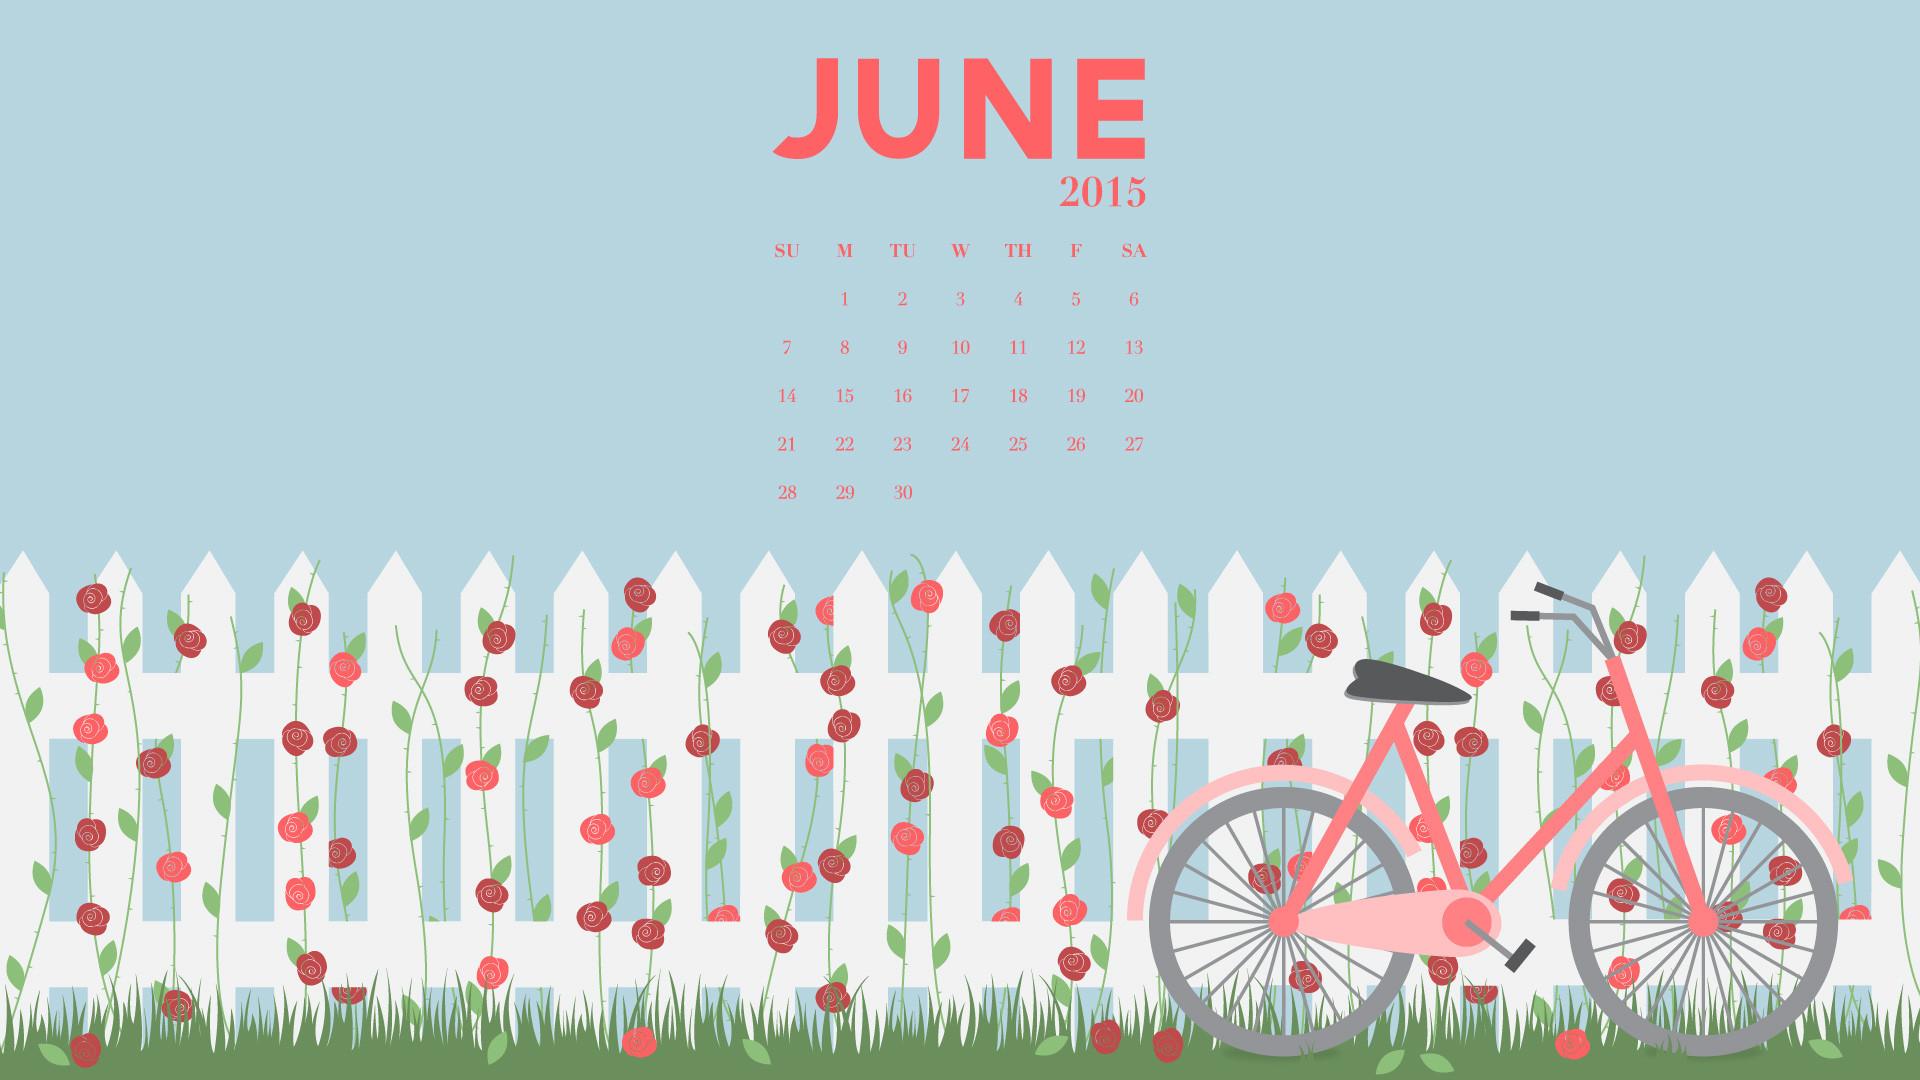 June Calendar Desktop Wallpaper : Desktop wallpapers calendar june  images